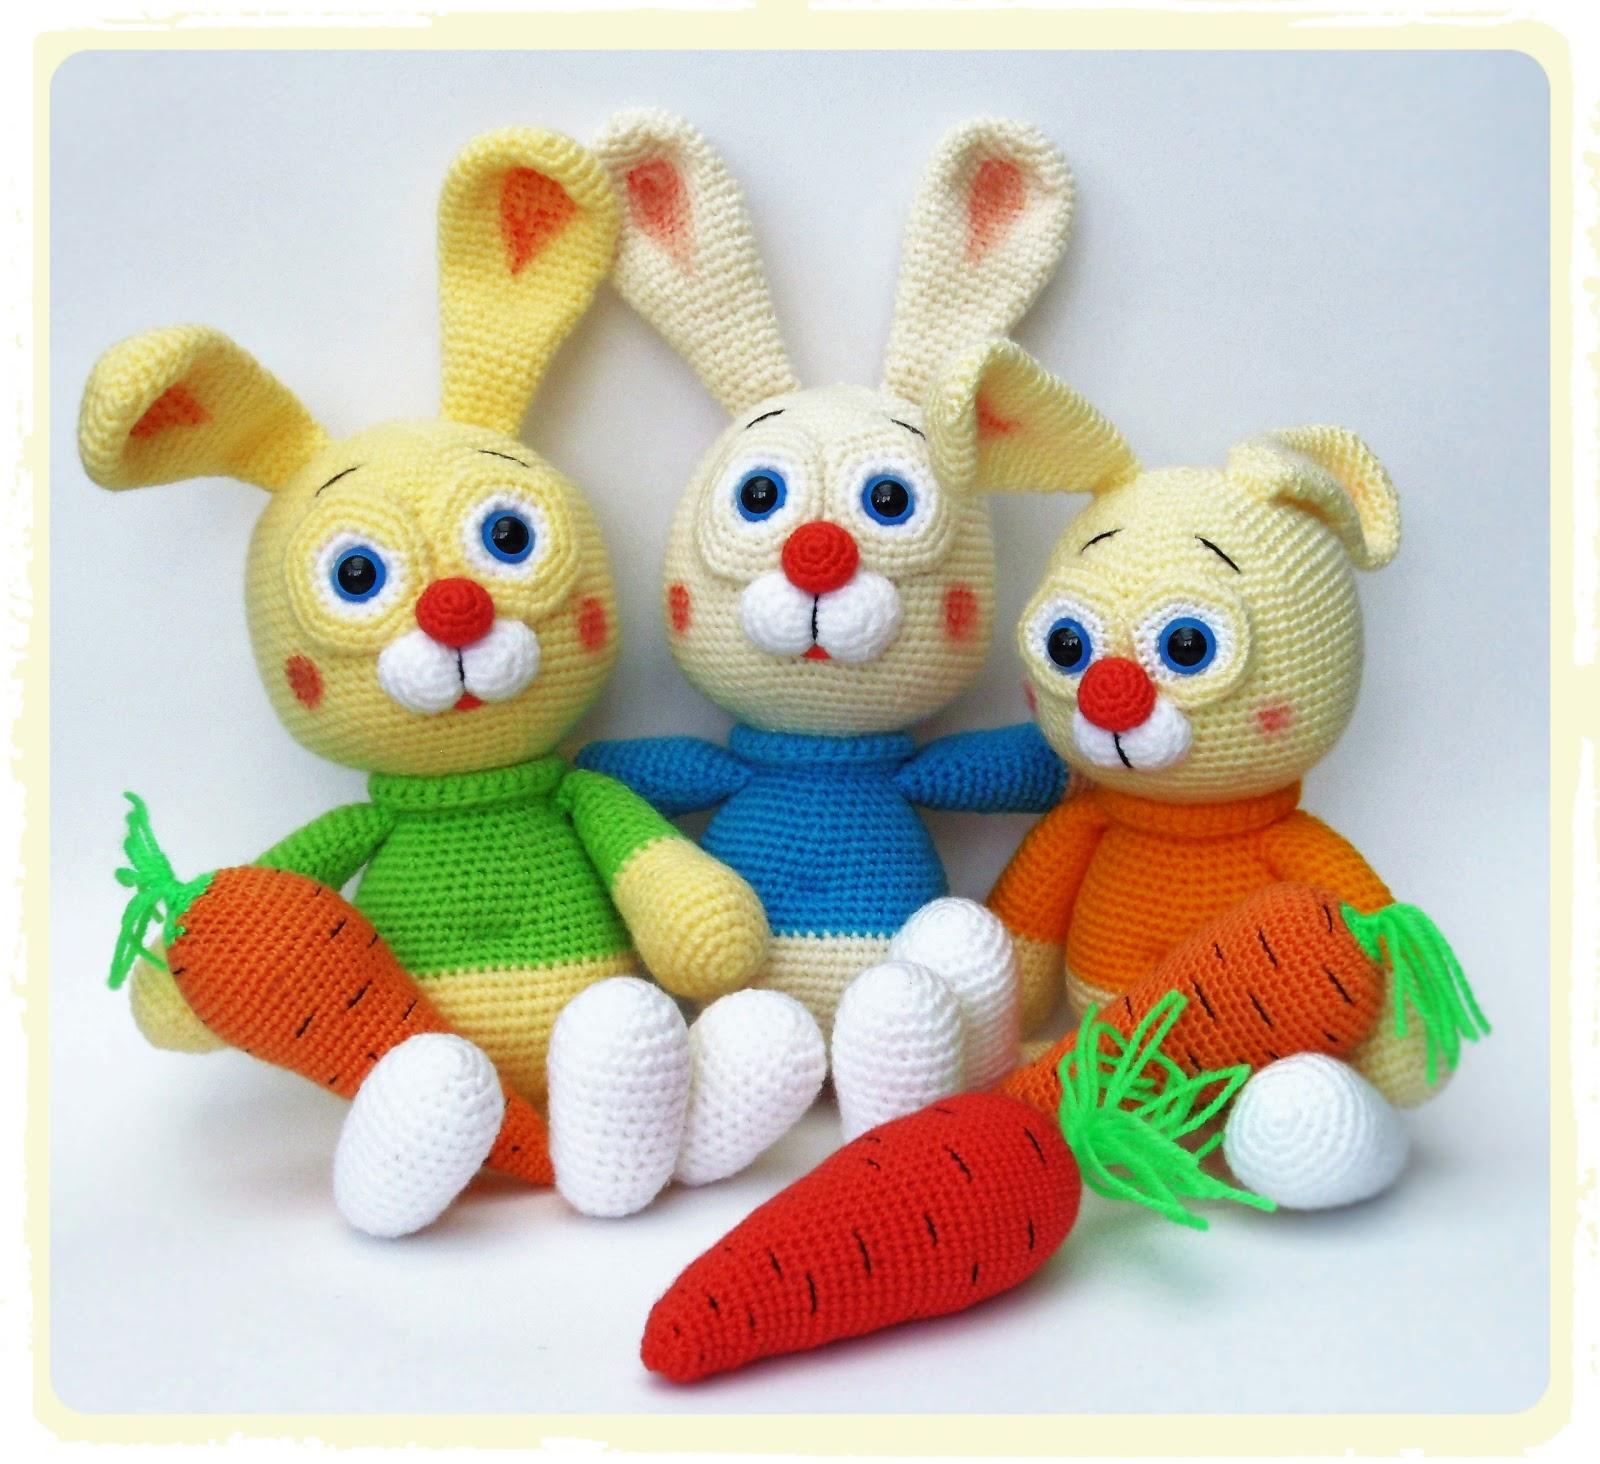 Kirju Mirju kasit??.: Amigurumi Jankud. Amigurumi Bunny.